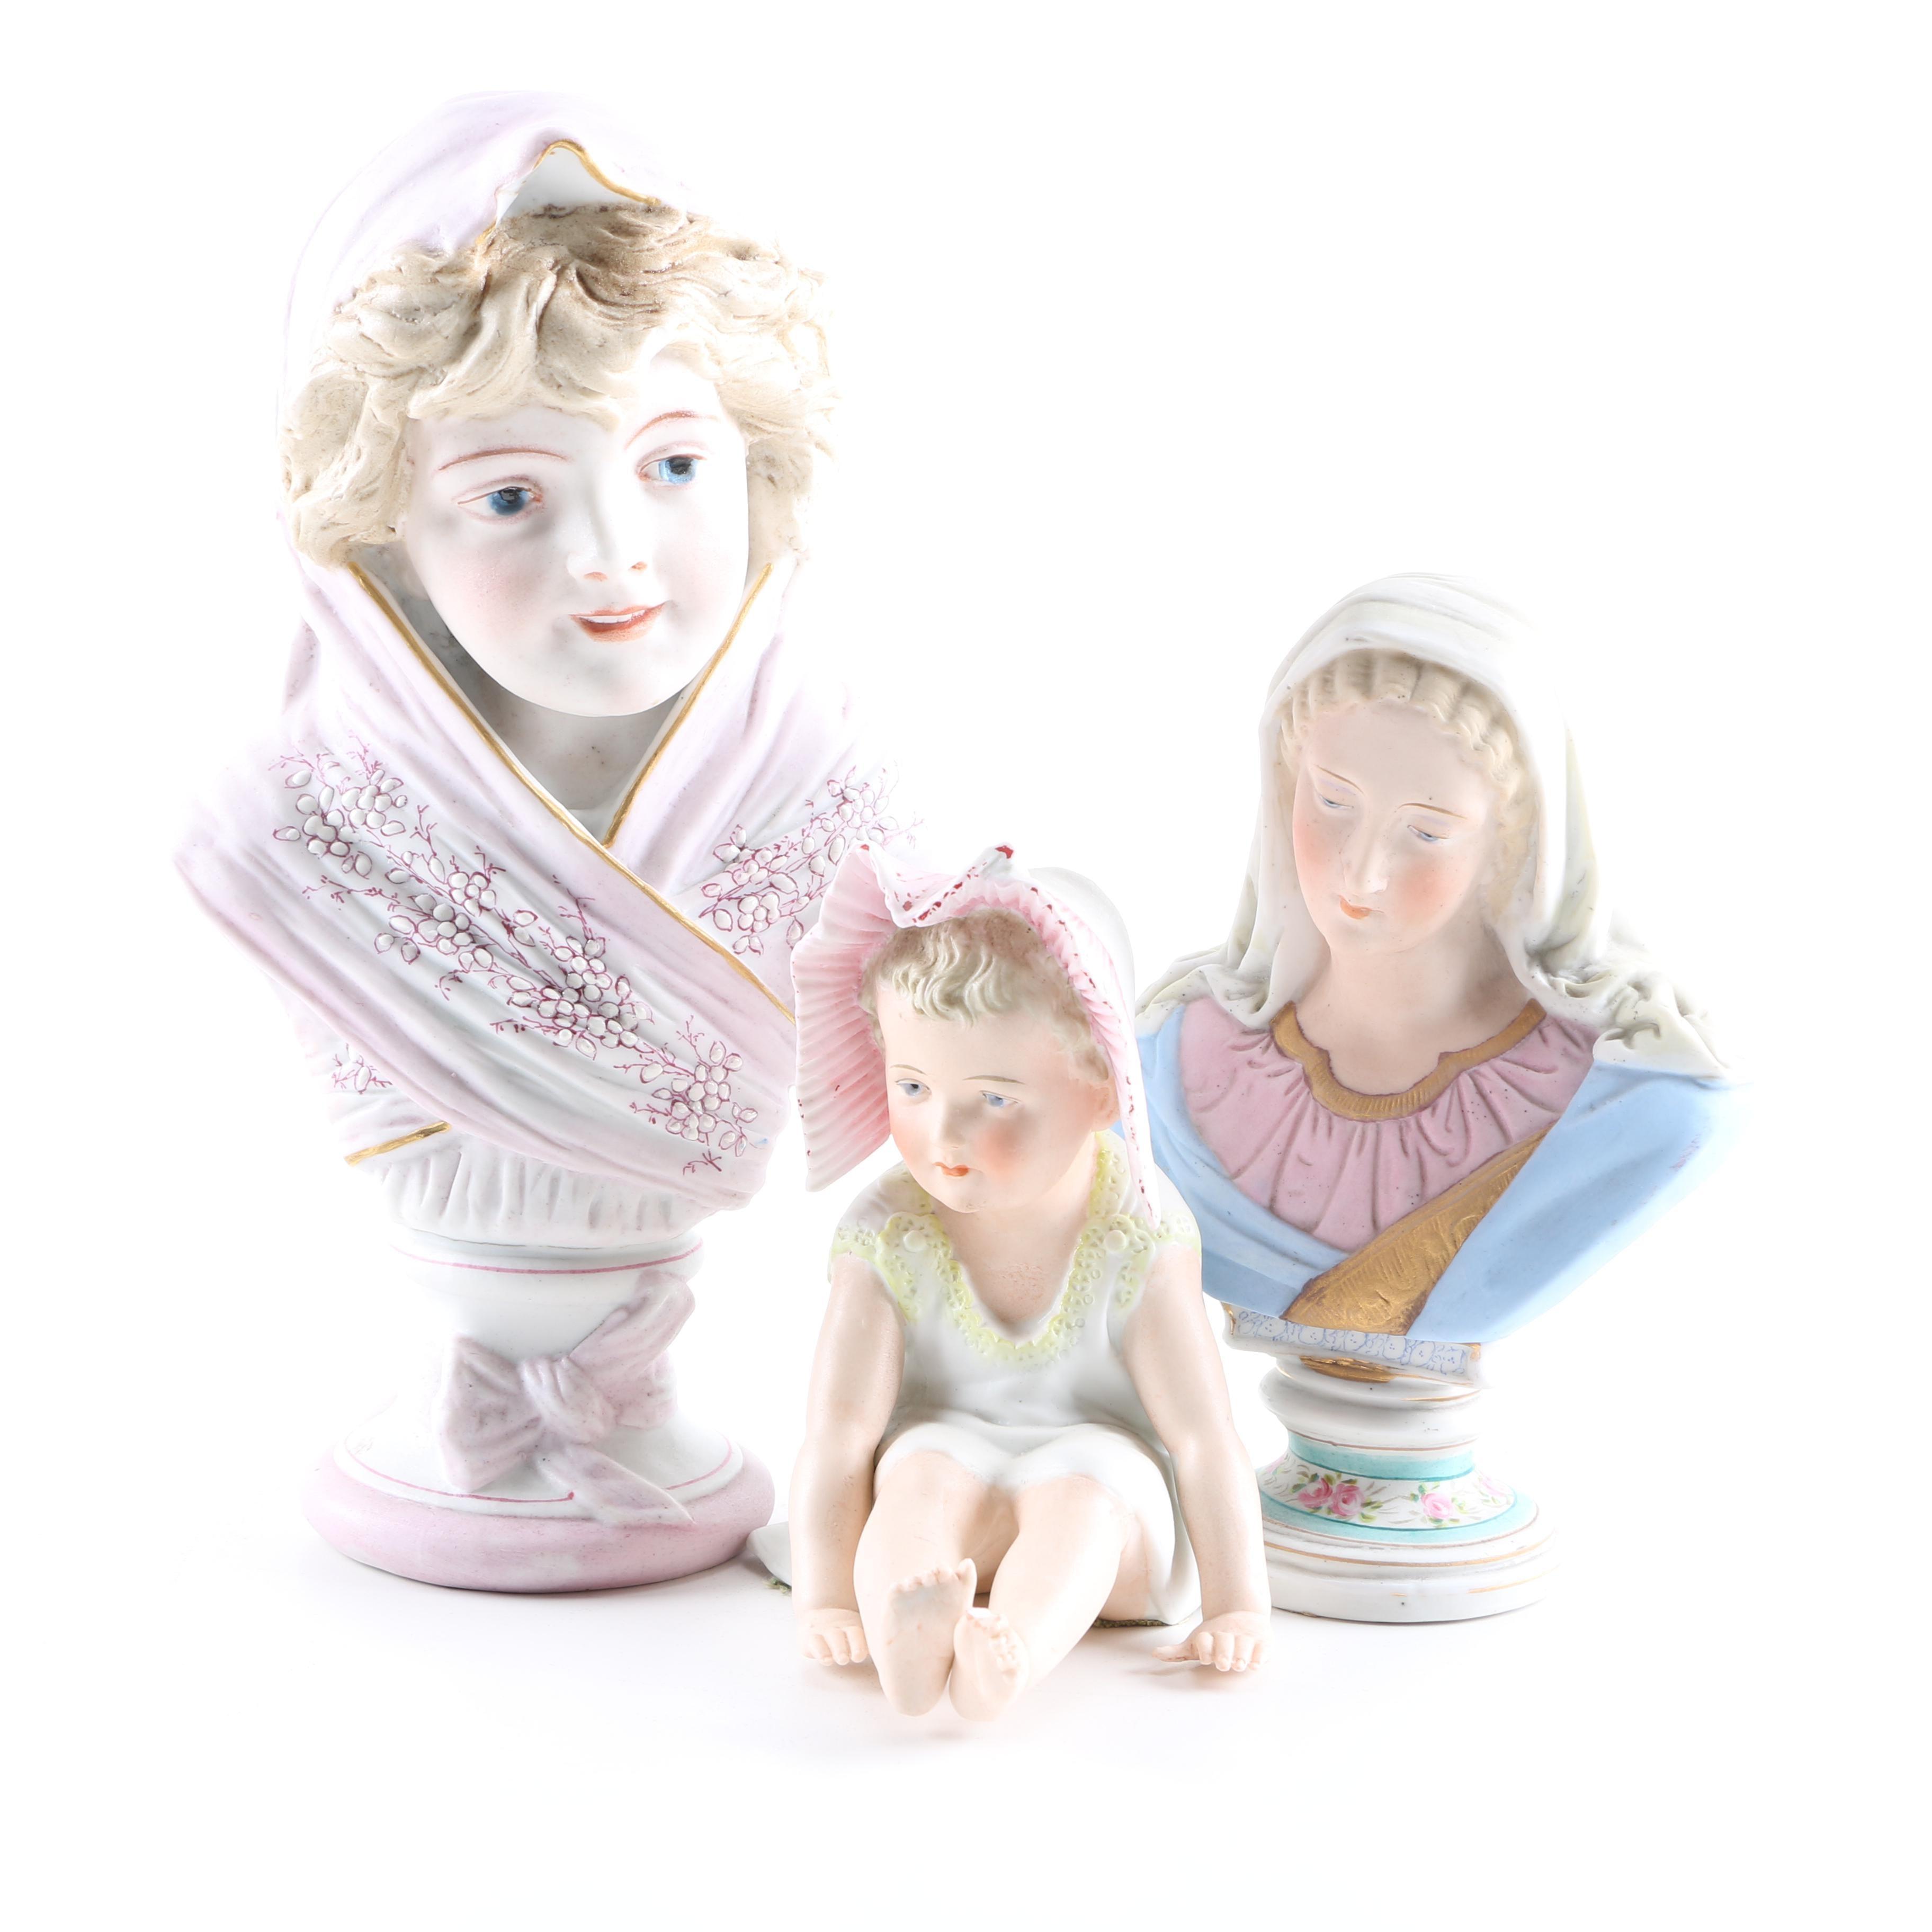 Antique Porcelain Busts and Figure